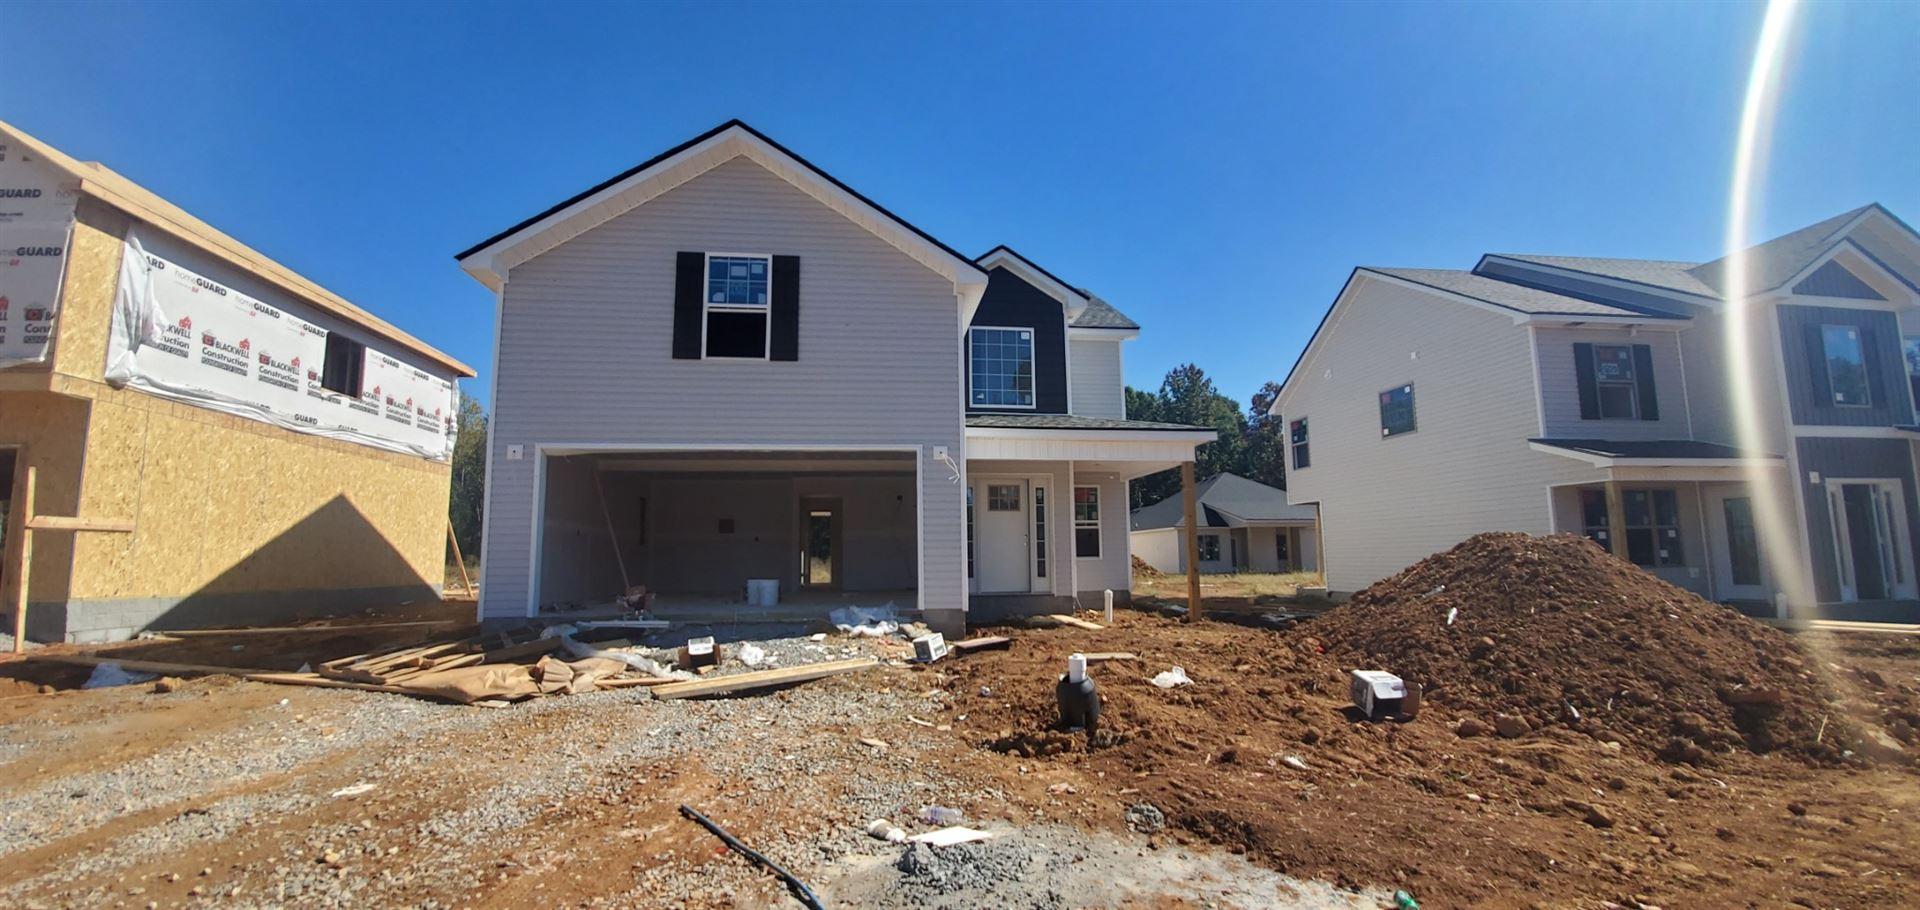 508 Fox Crossing, Clarksville, TN 37040 - MLS#: 2166373